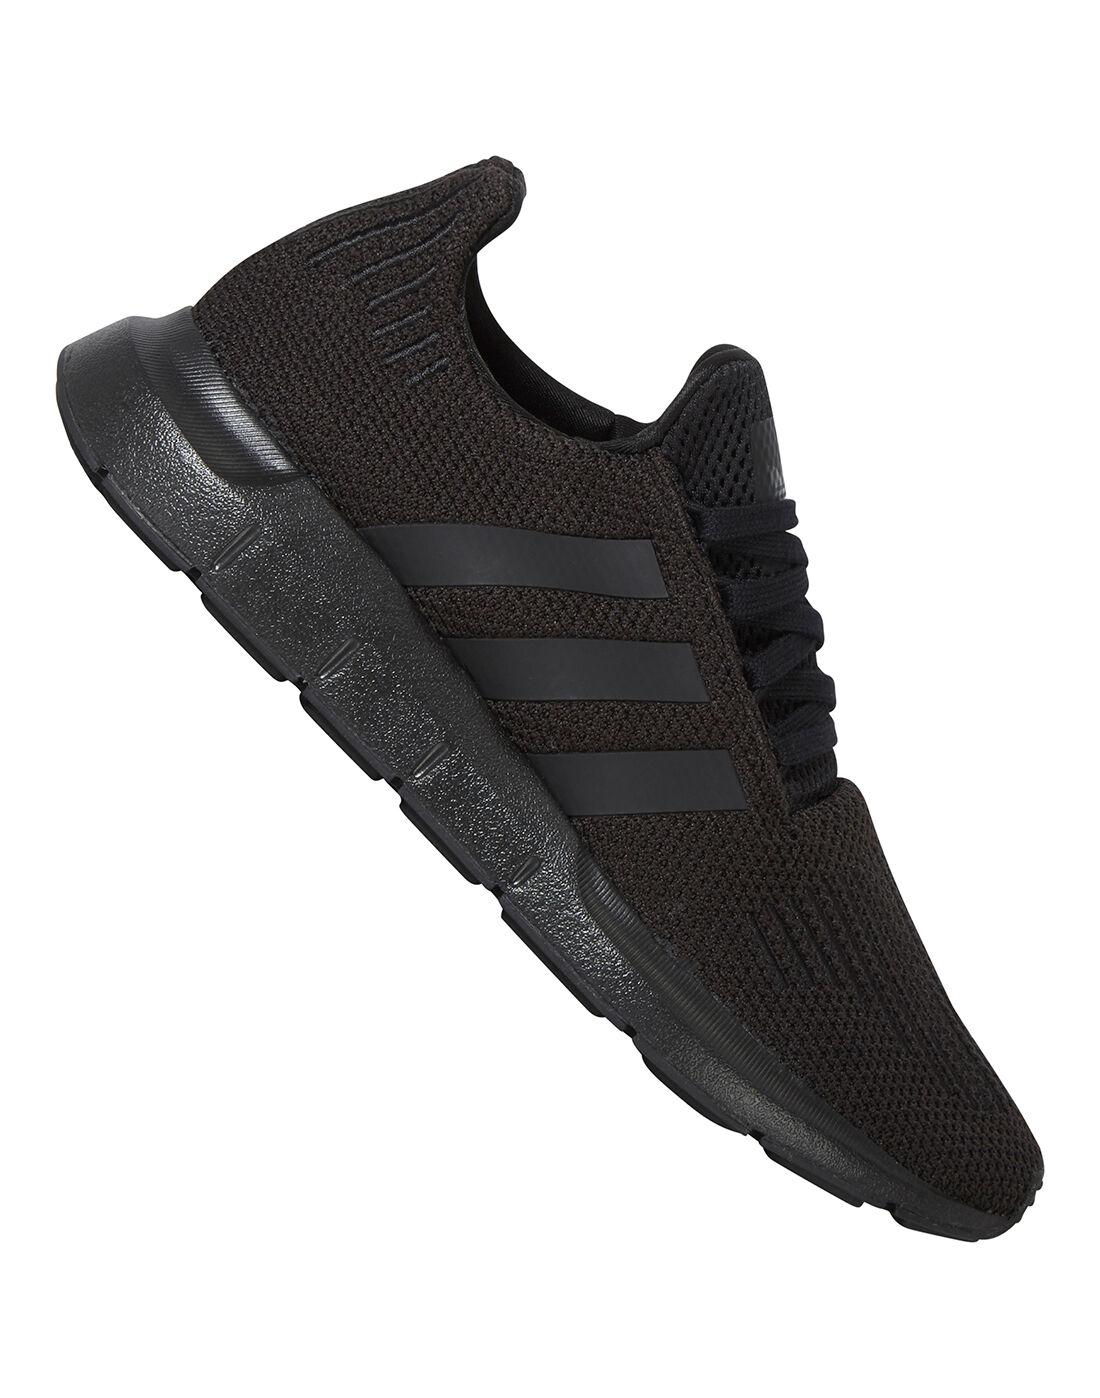 Hombres Trainers Nike De Adidas Zapatos De Estilo De Nike Vida Deportiva dc5e15